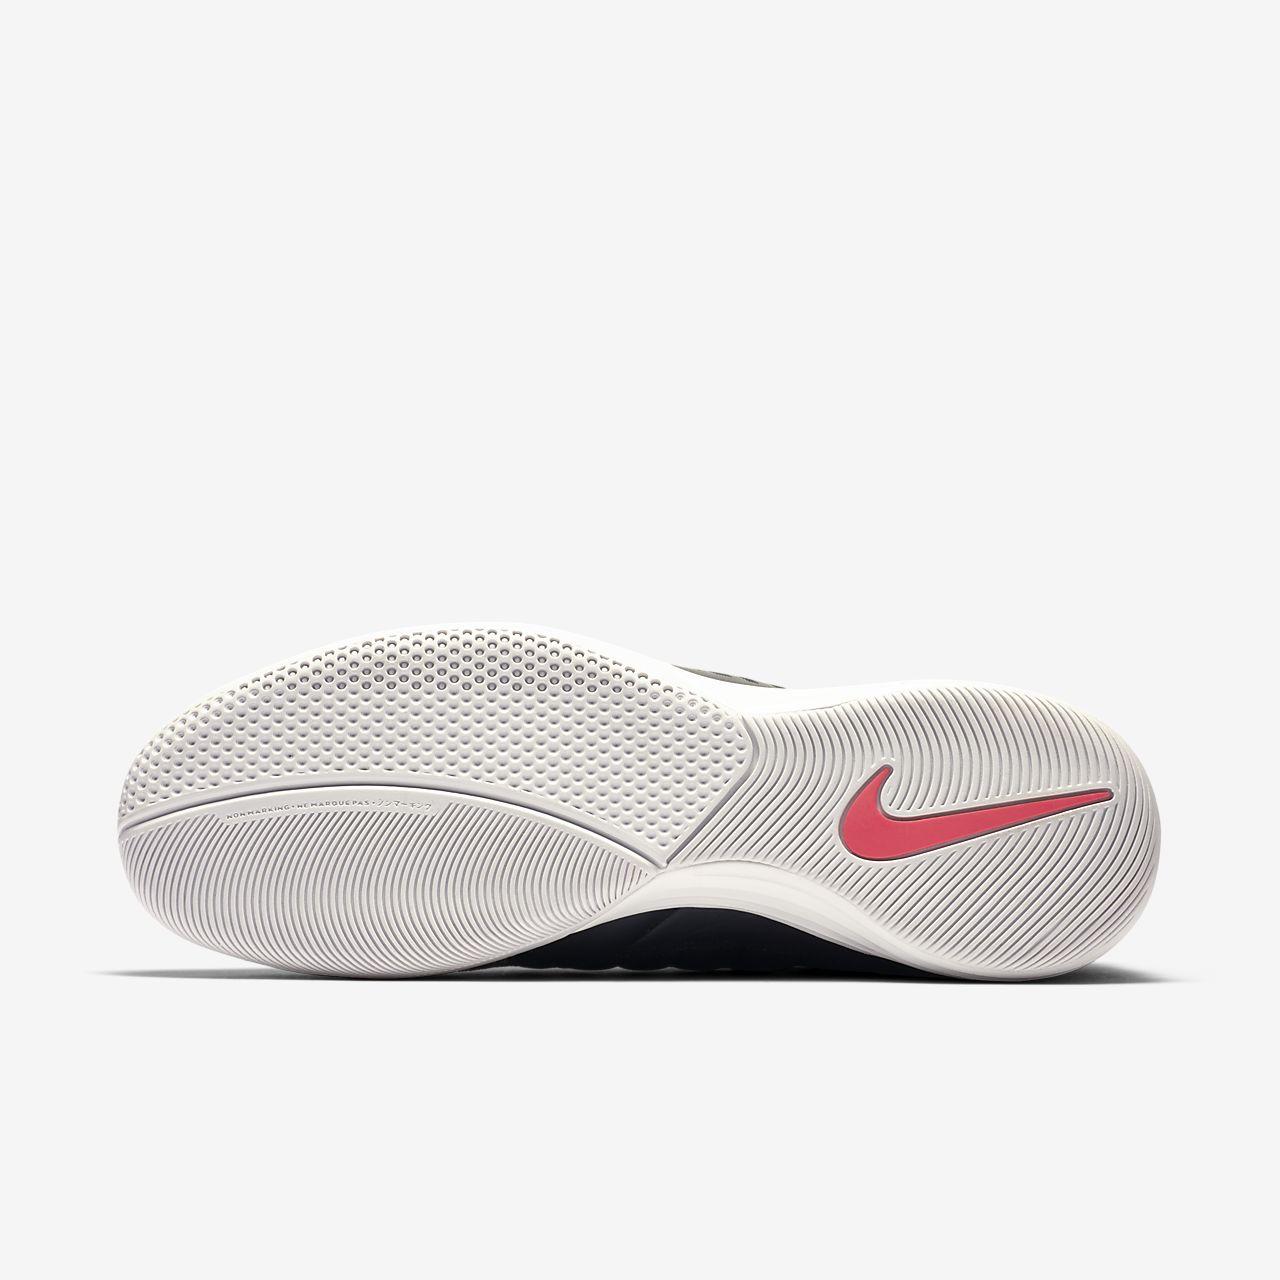 new products df209 b5018 ... FC247 LunarGato II Football Shoe